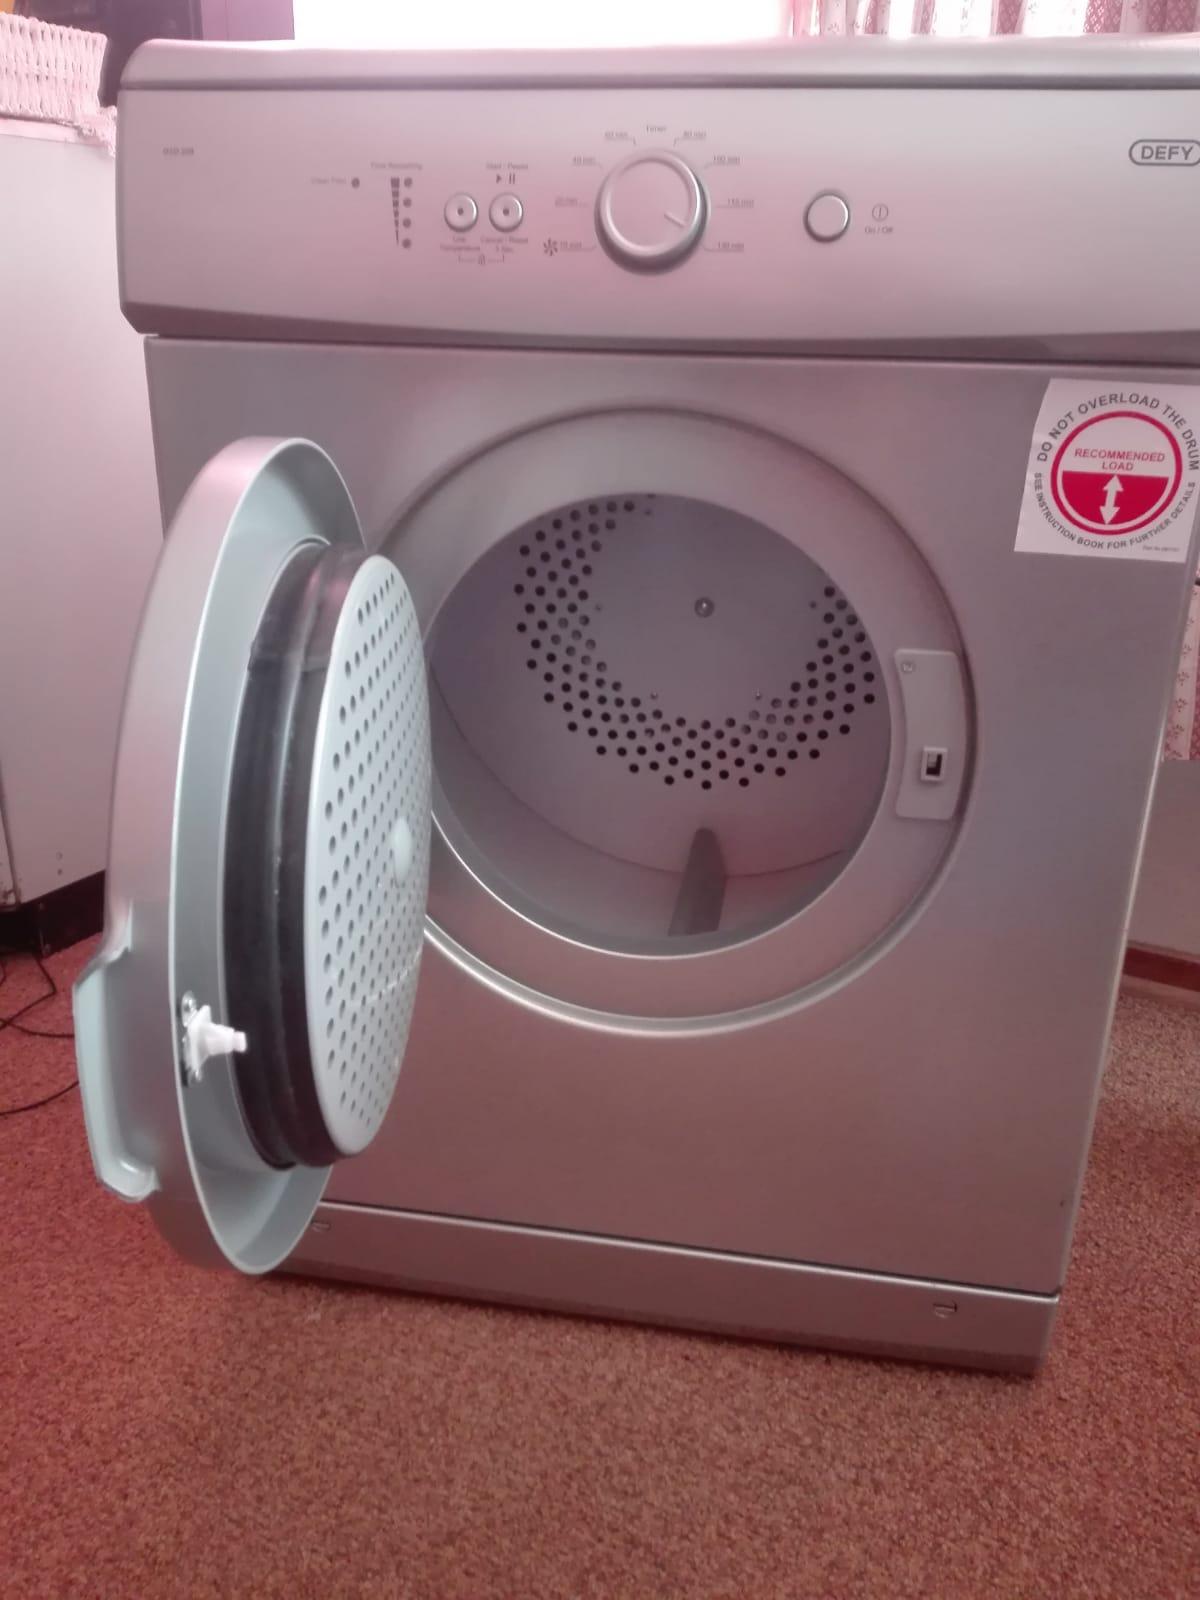 Defy Tumble dryer - good as new